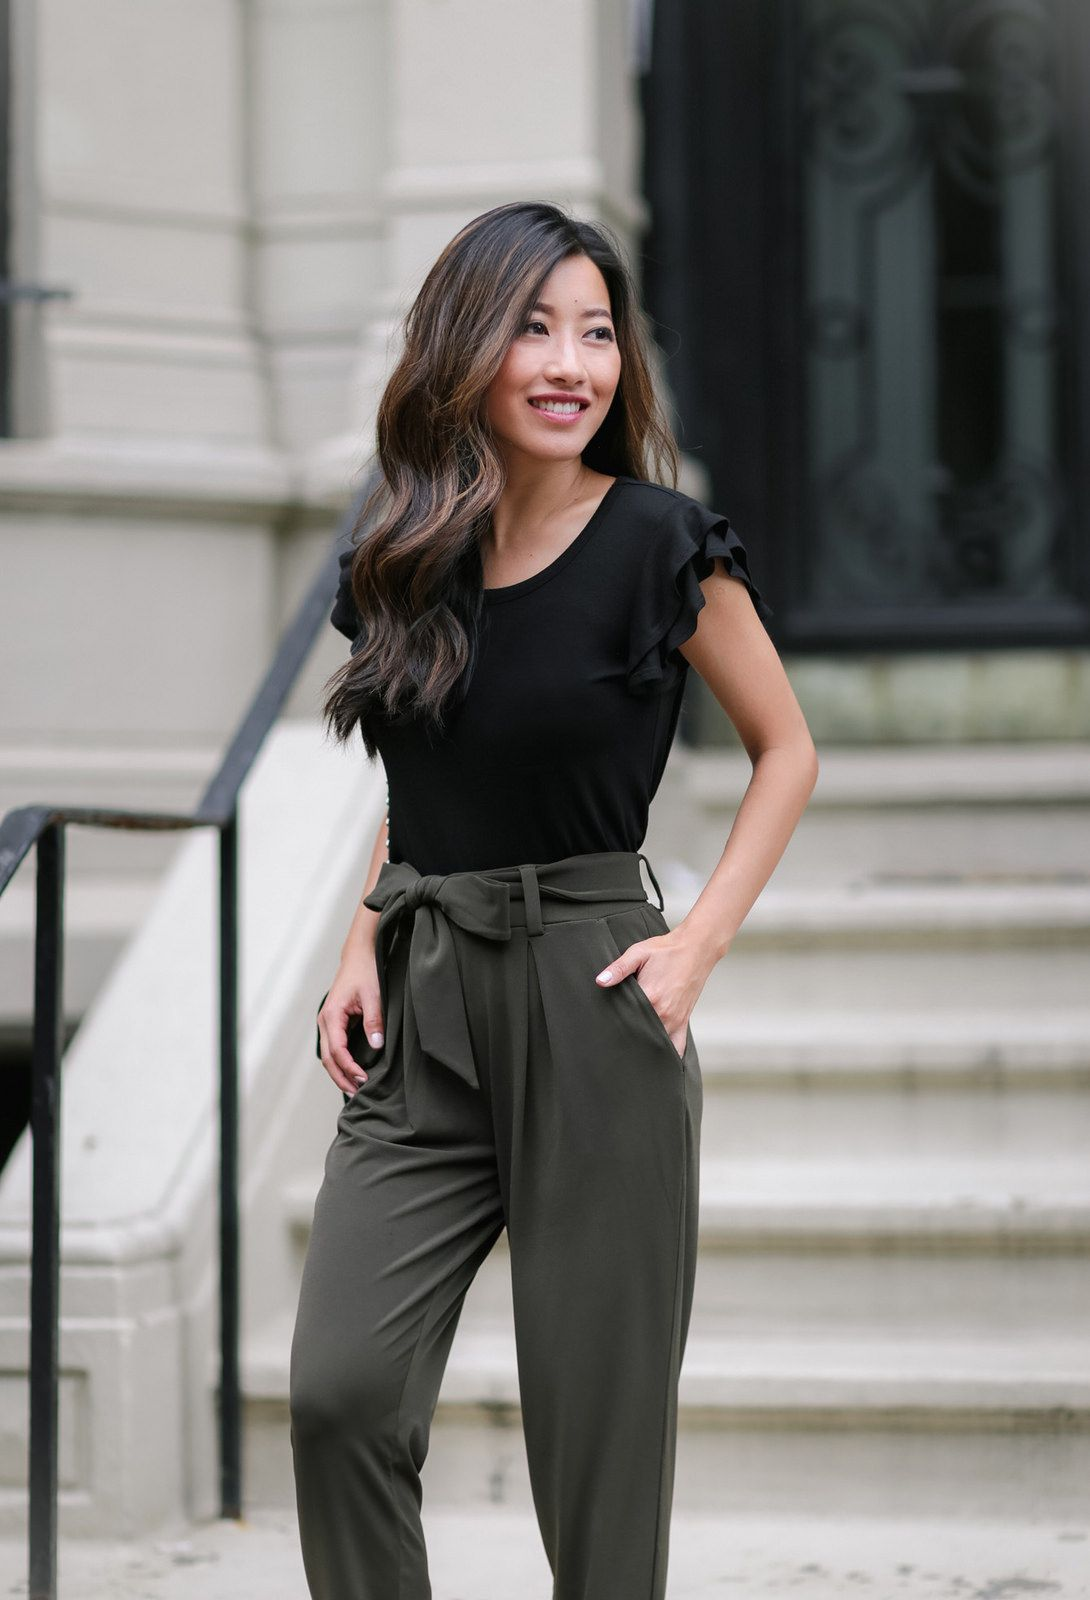 Soft Jersey Drape Pants Black Cropped Blazer Extra Petite Drape Pants Dress Pants Outfits Petite Outfits [ 1600 x 1090 Pixel ]